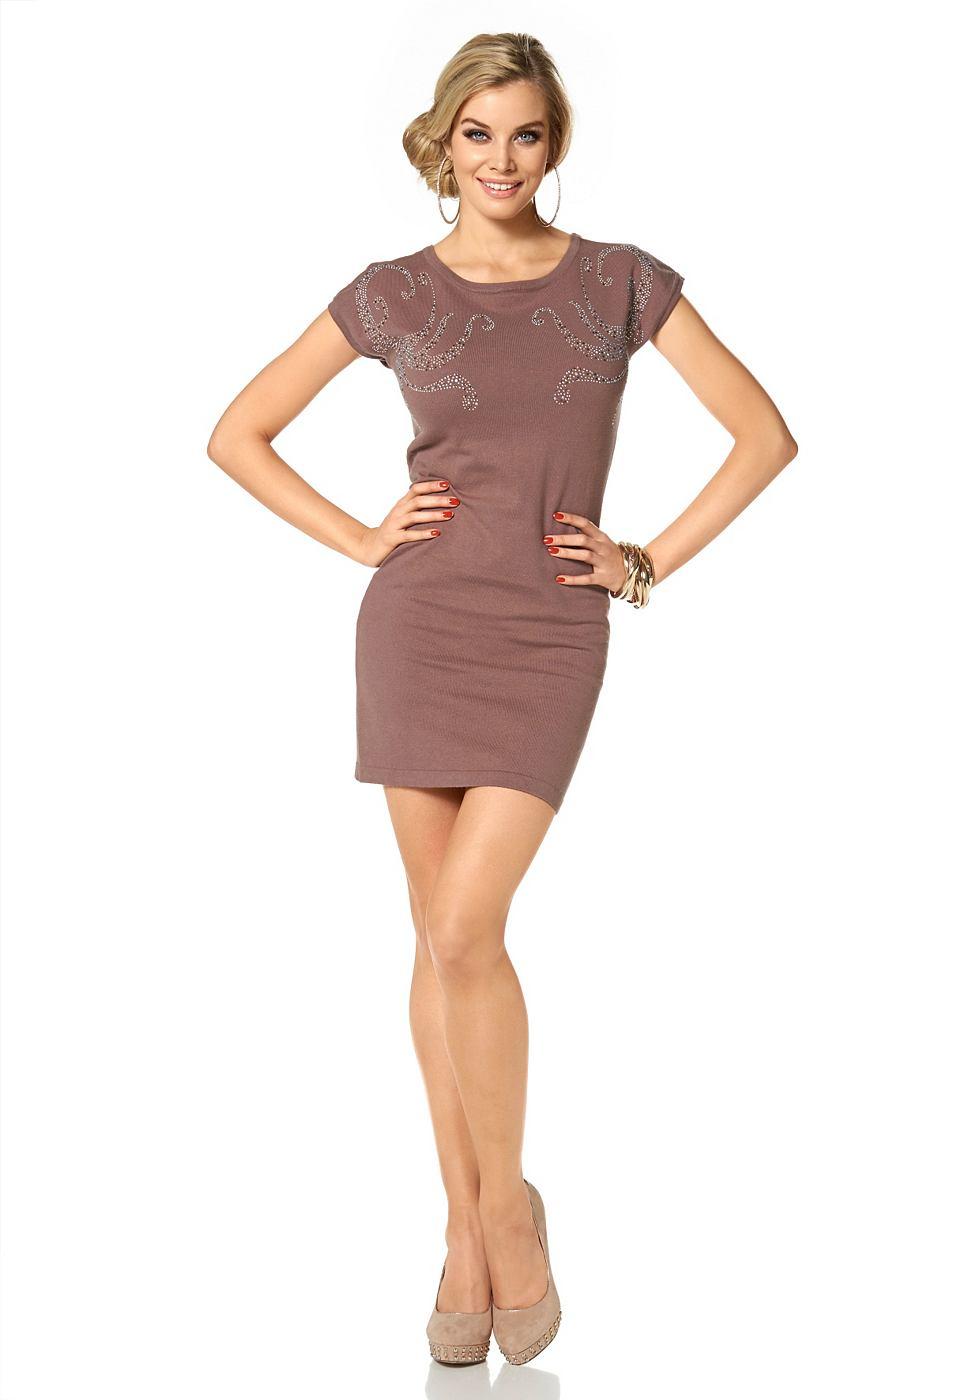 Melrose Tricot-jurk met strasapplicatie bruin